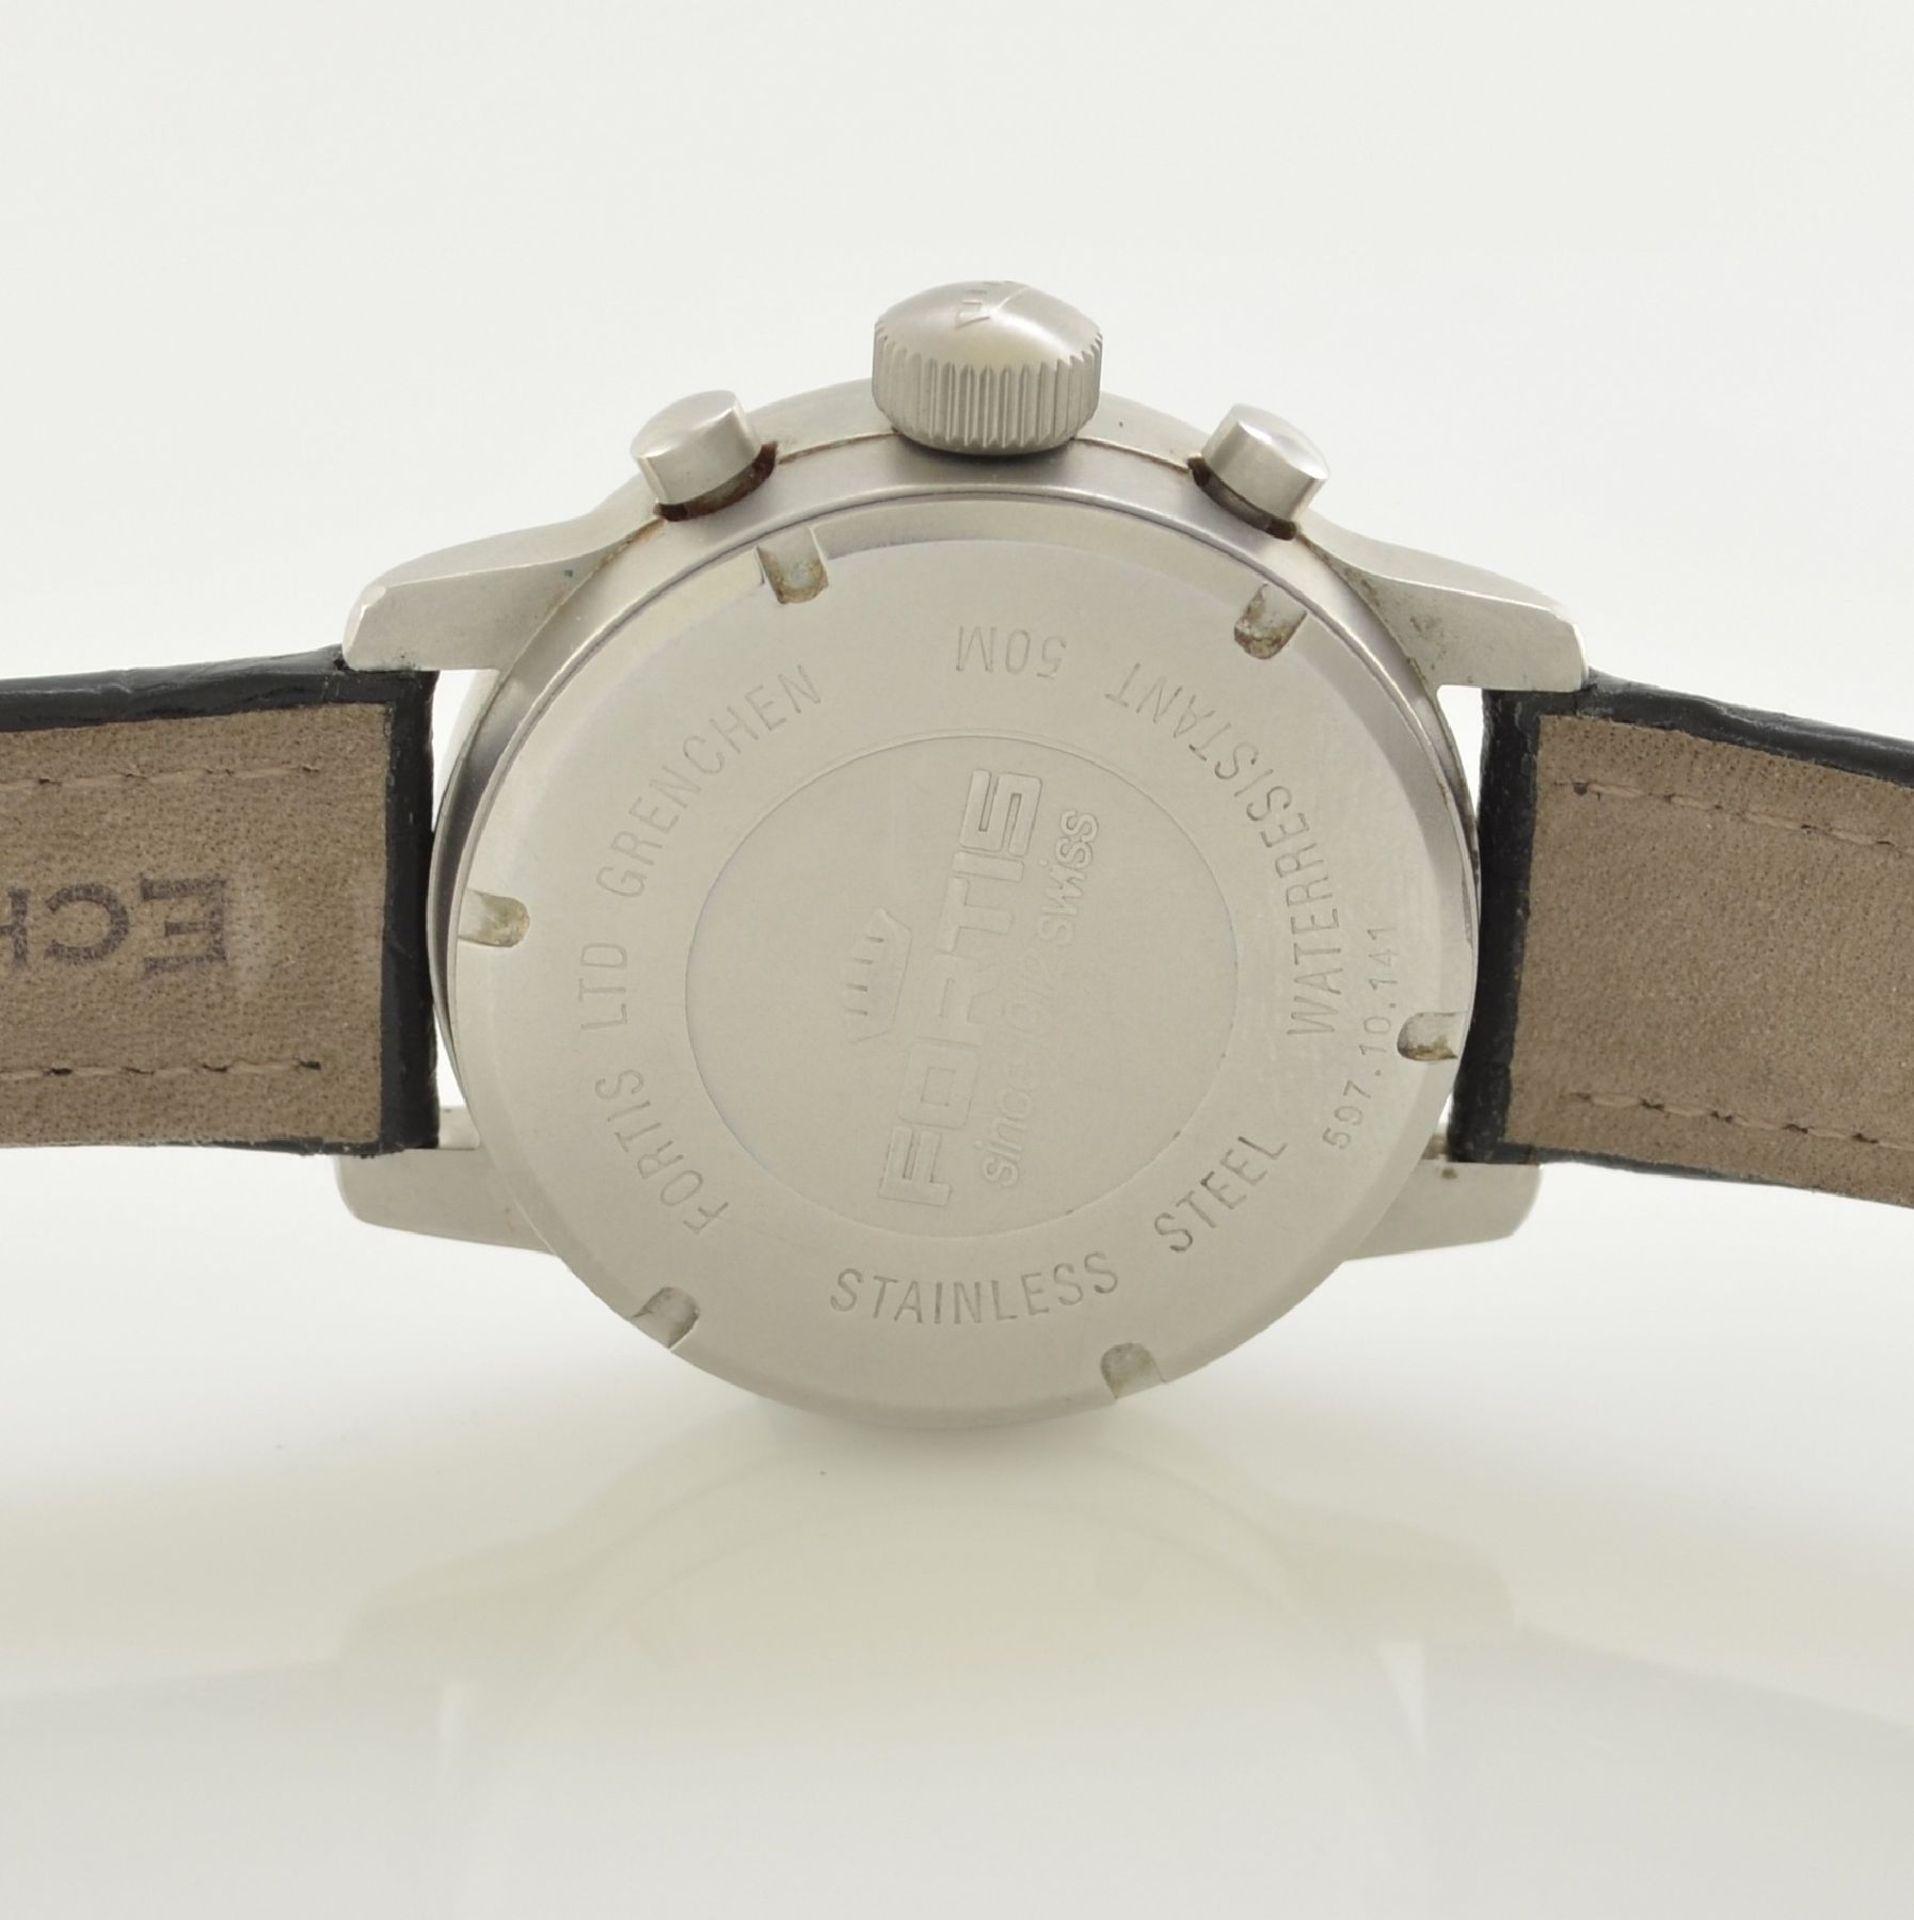 FORTIS Fliegerchronograph, Automatik, Ref. 597.10.11, matt. Edelstahlgeh. inkl. Lederband m. orig. - Bild 6 aus 7